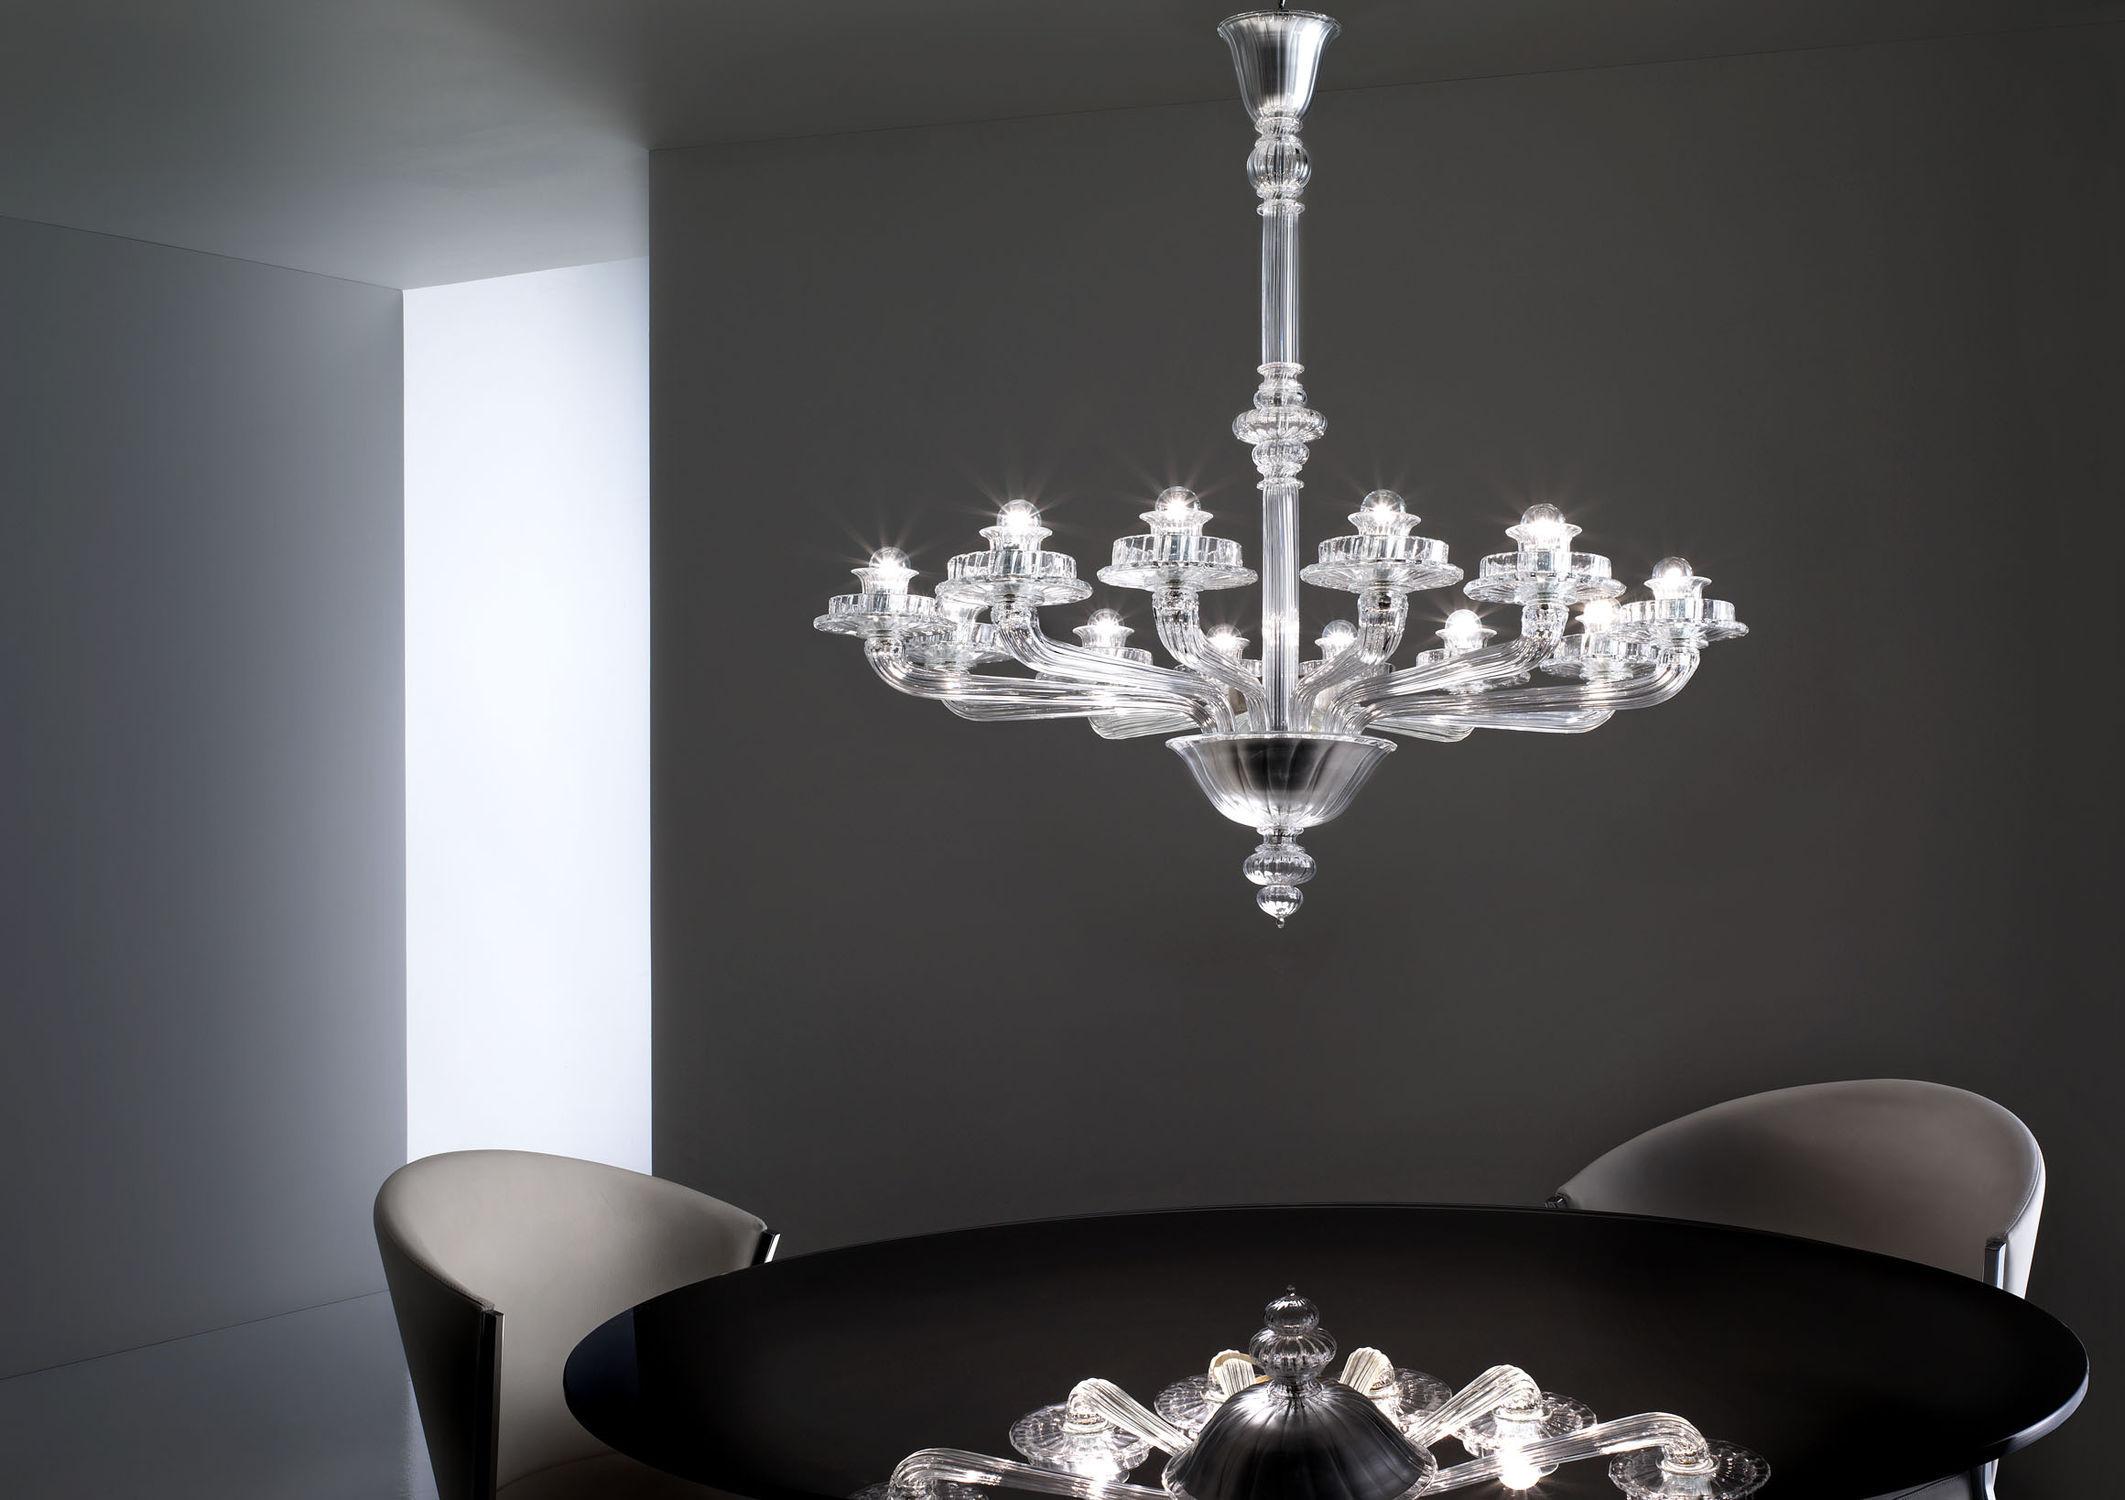 lampadario moderno / in vetro / in vetro soffiato / in metallo